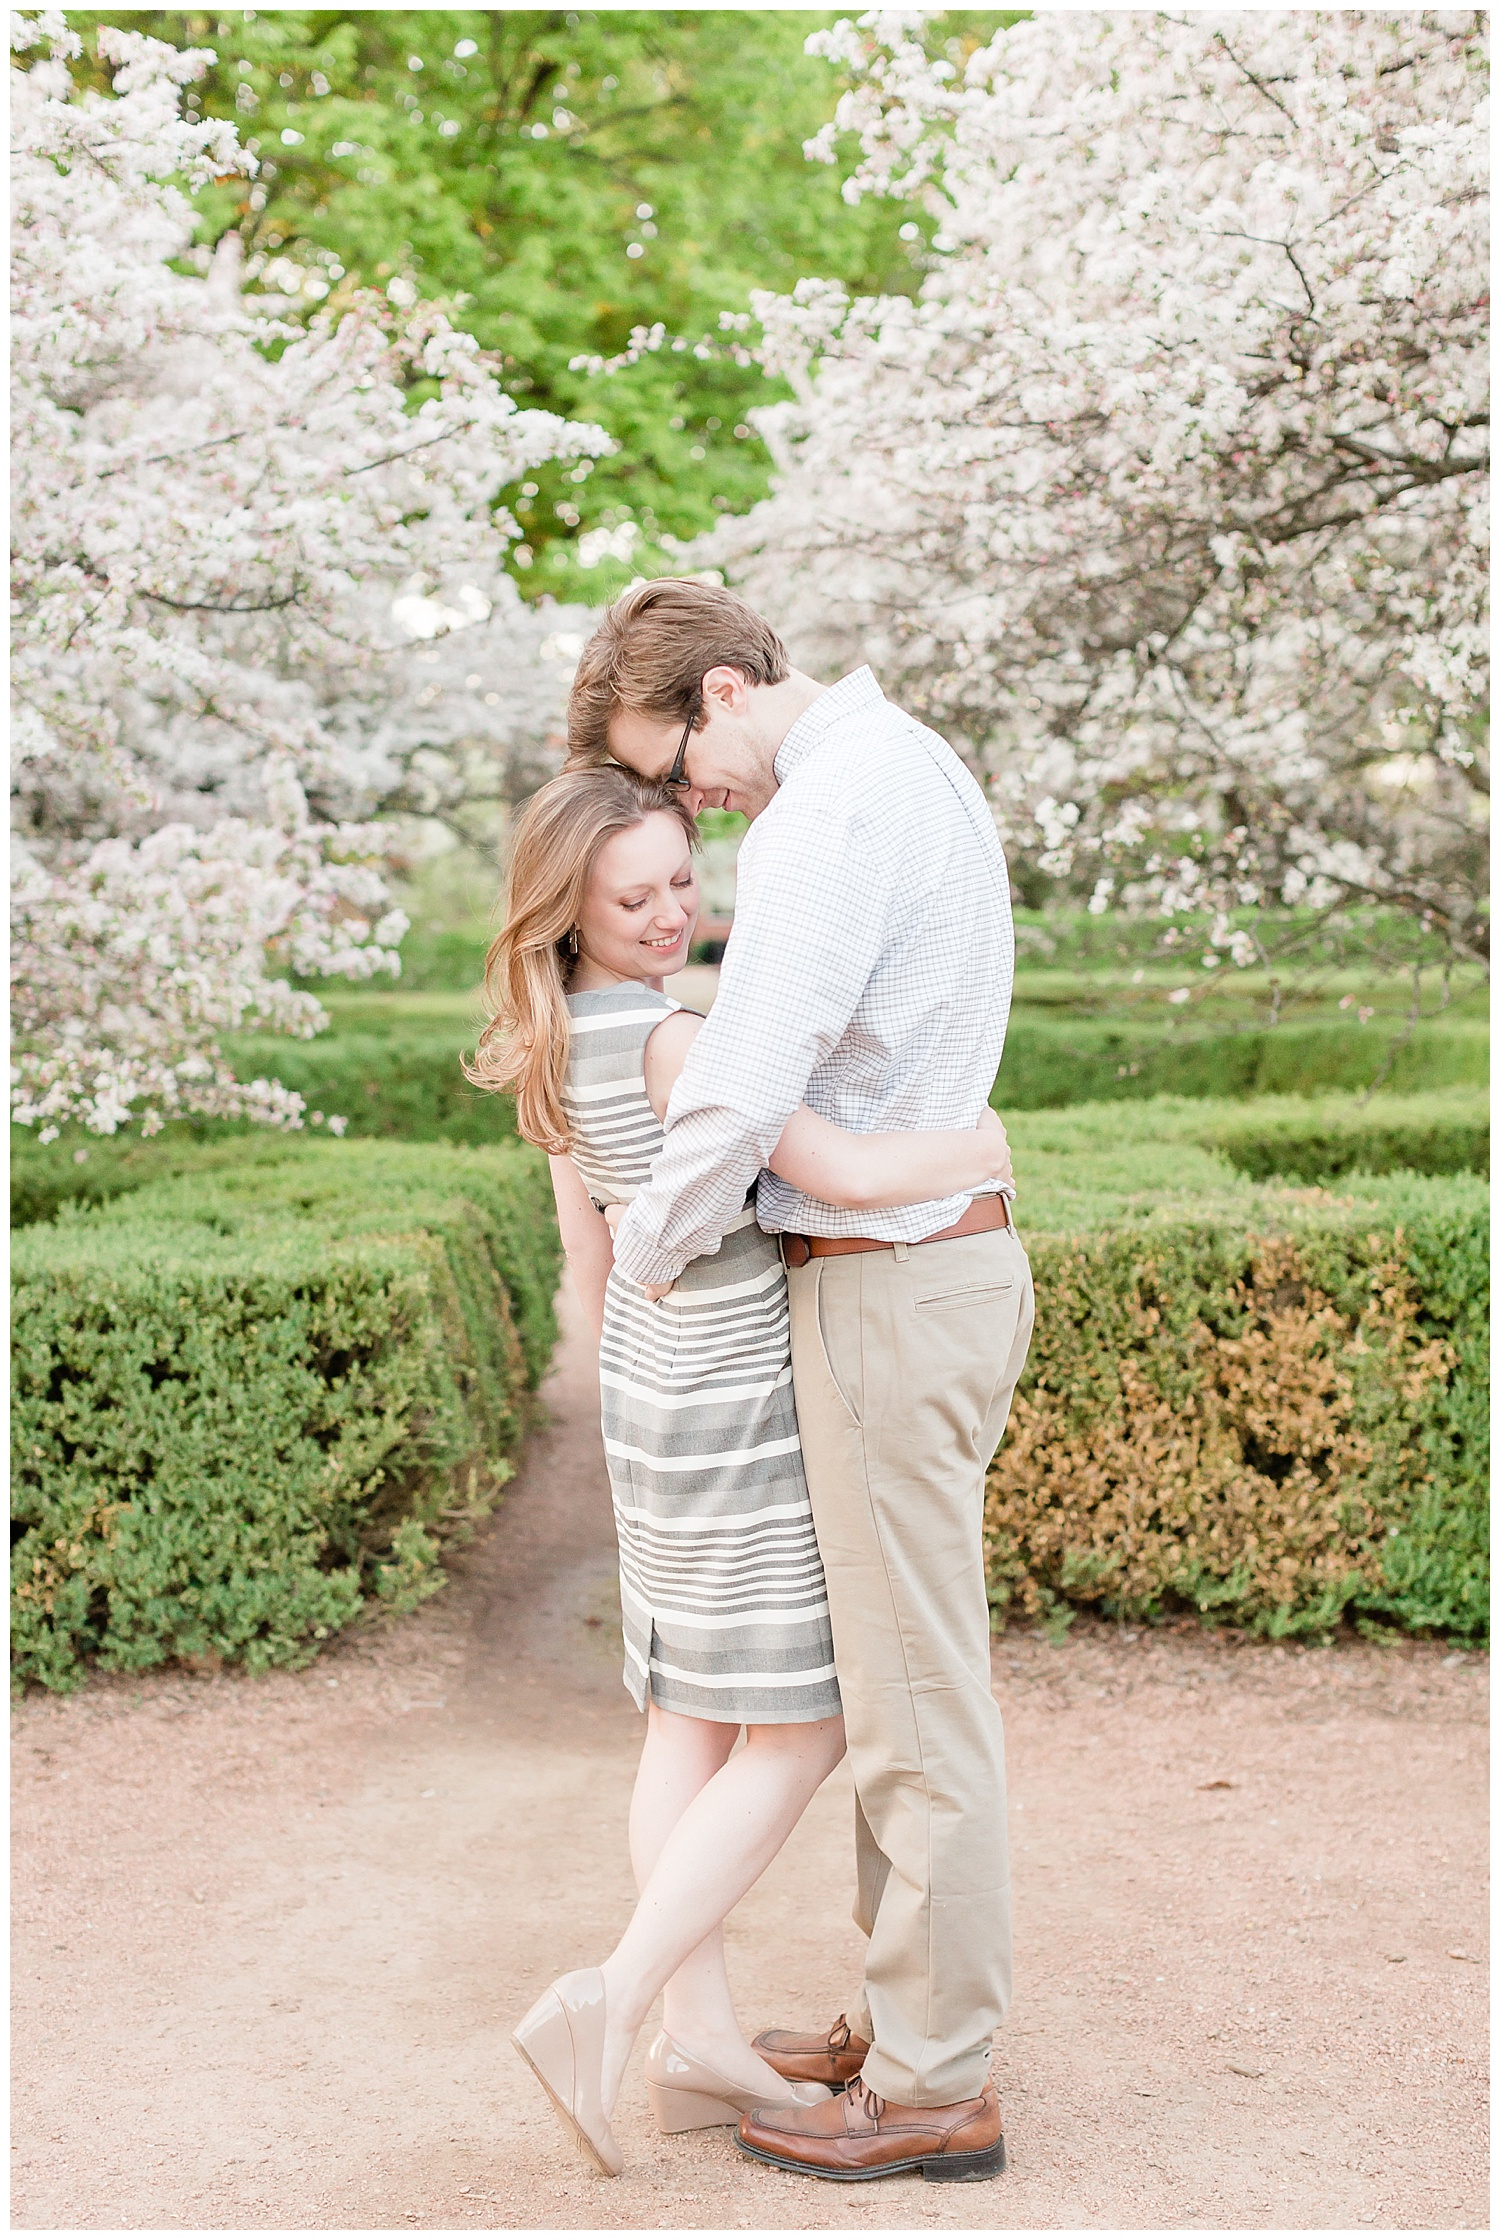 morton-arboretum-lisle-wedding-photographer-summer-engagement-session_0007.jpg